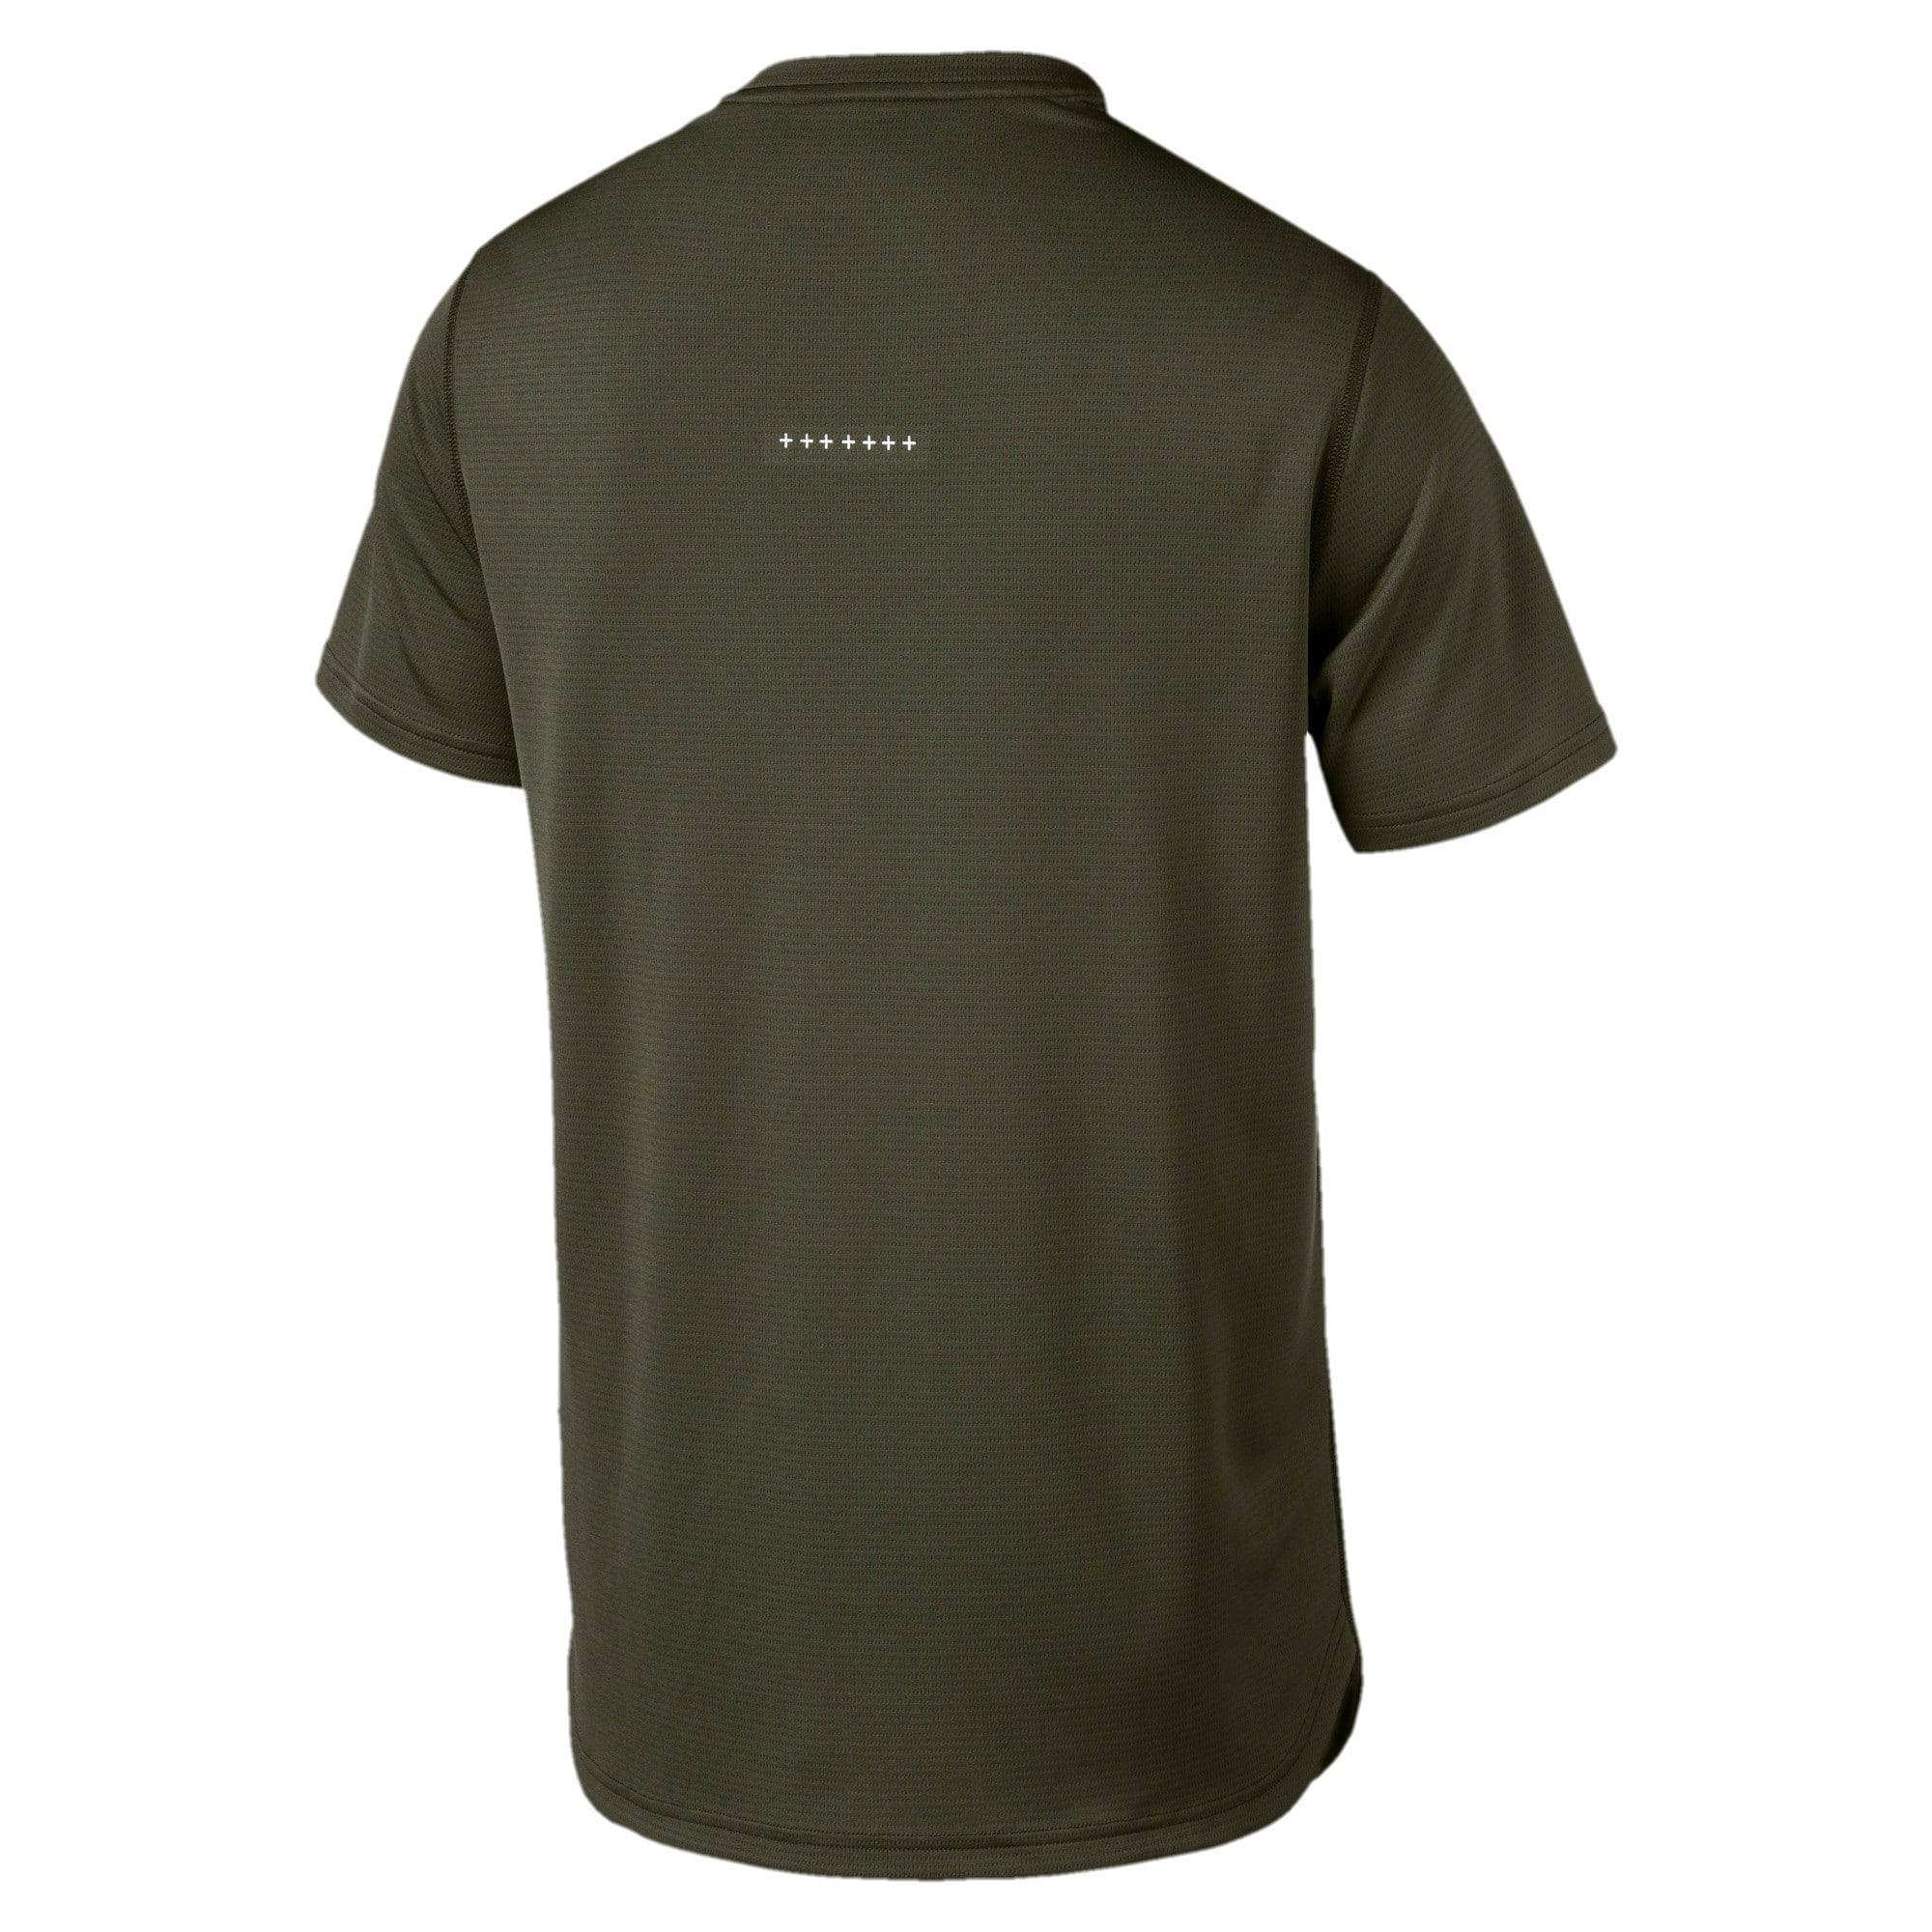 Thumbnail 5 of Running Men's IGNITE Mono T-Shirt, Forest Night, medium-IND